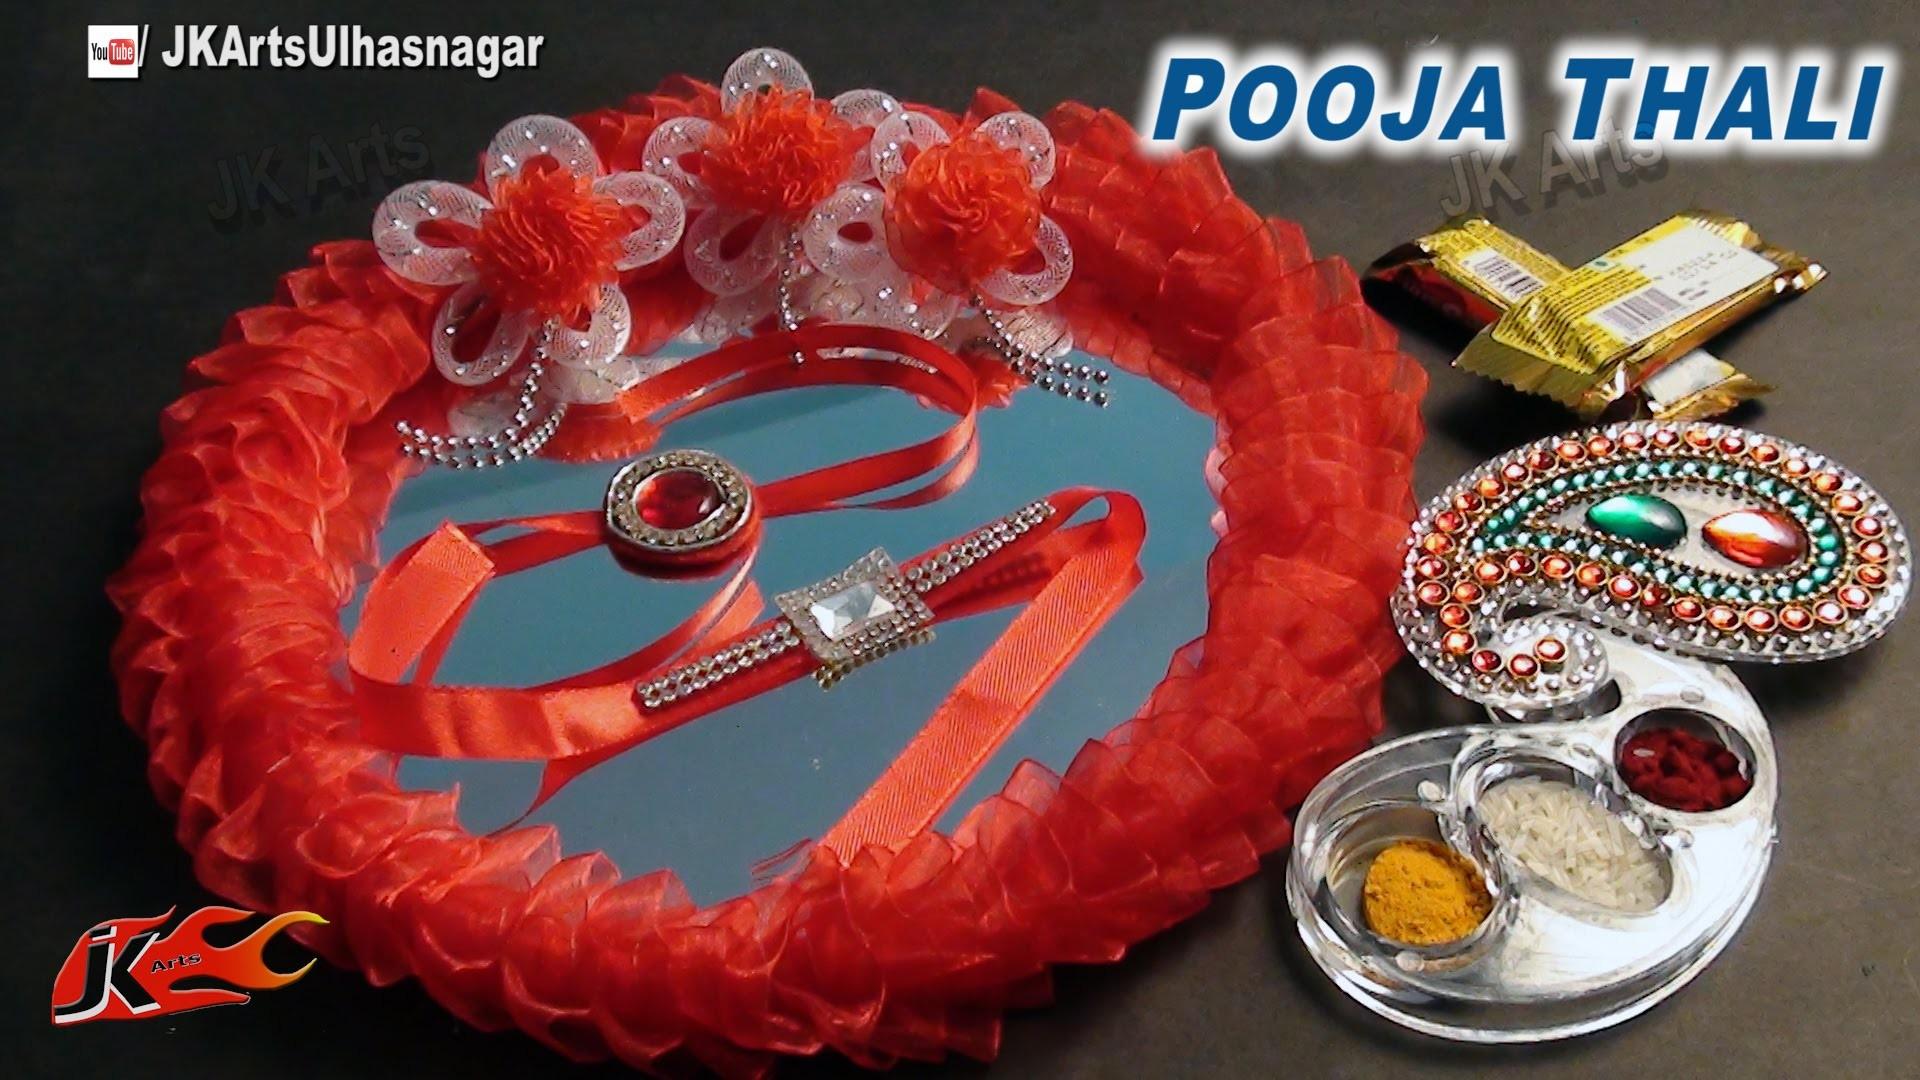 DIY Pooja Thali Making and  Decoration for Raksha Bandhan - JK Arts 631